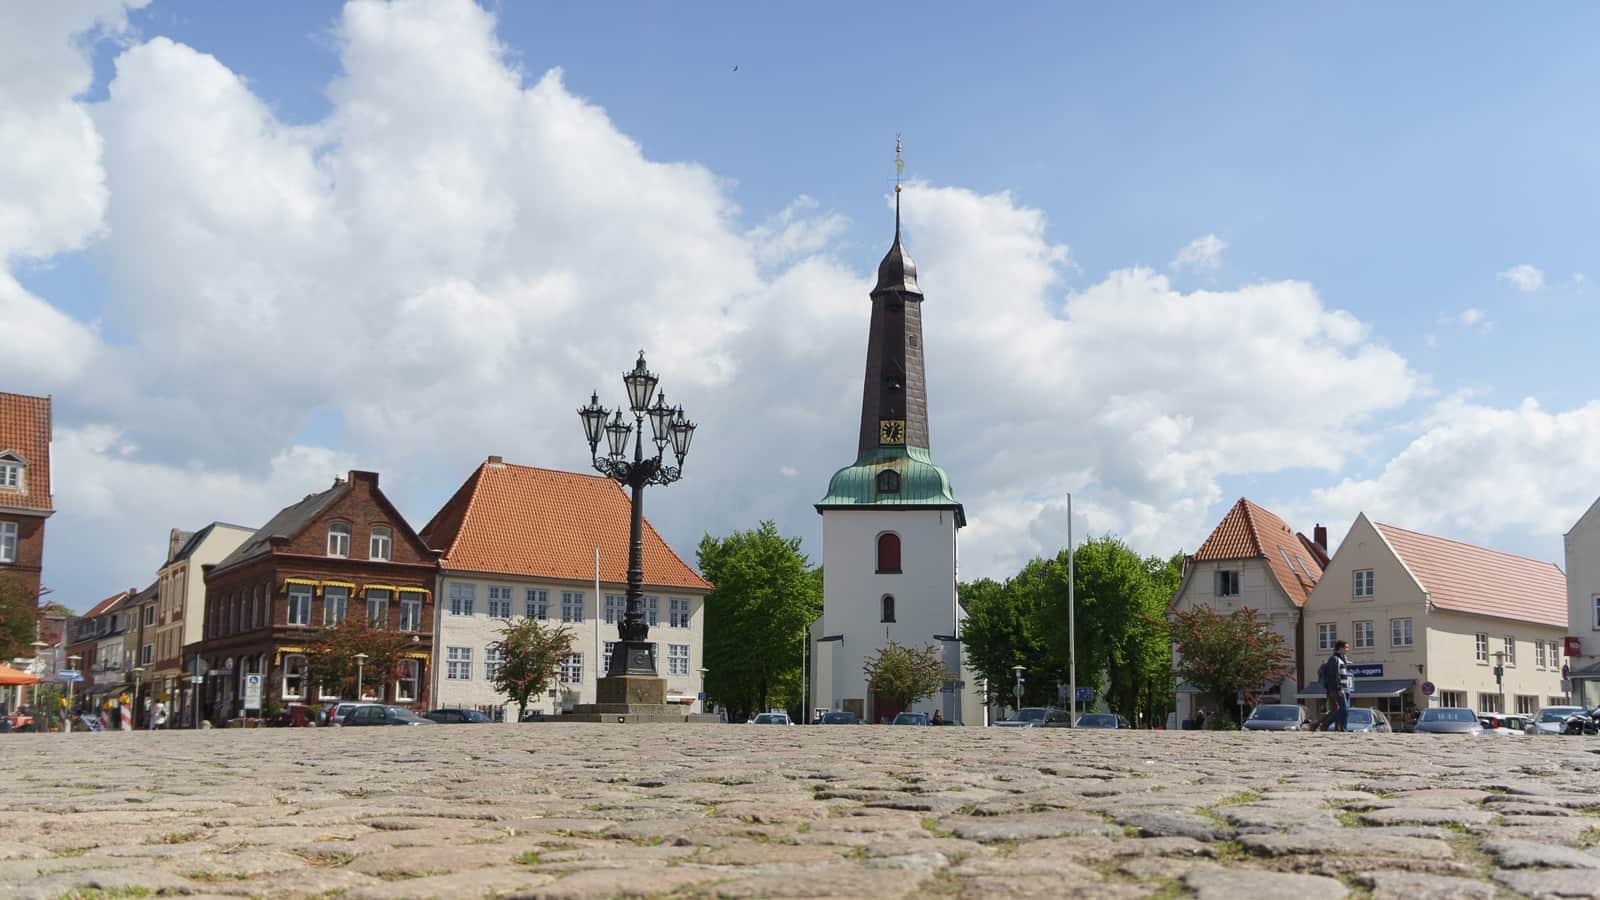 Glückstadt Markplatz mit Kirche (c) GDM